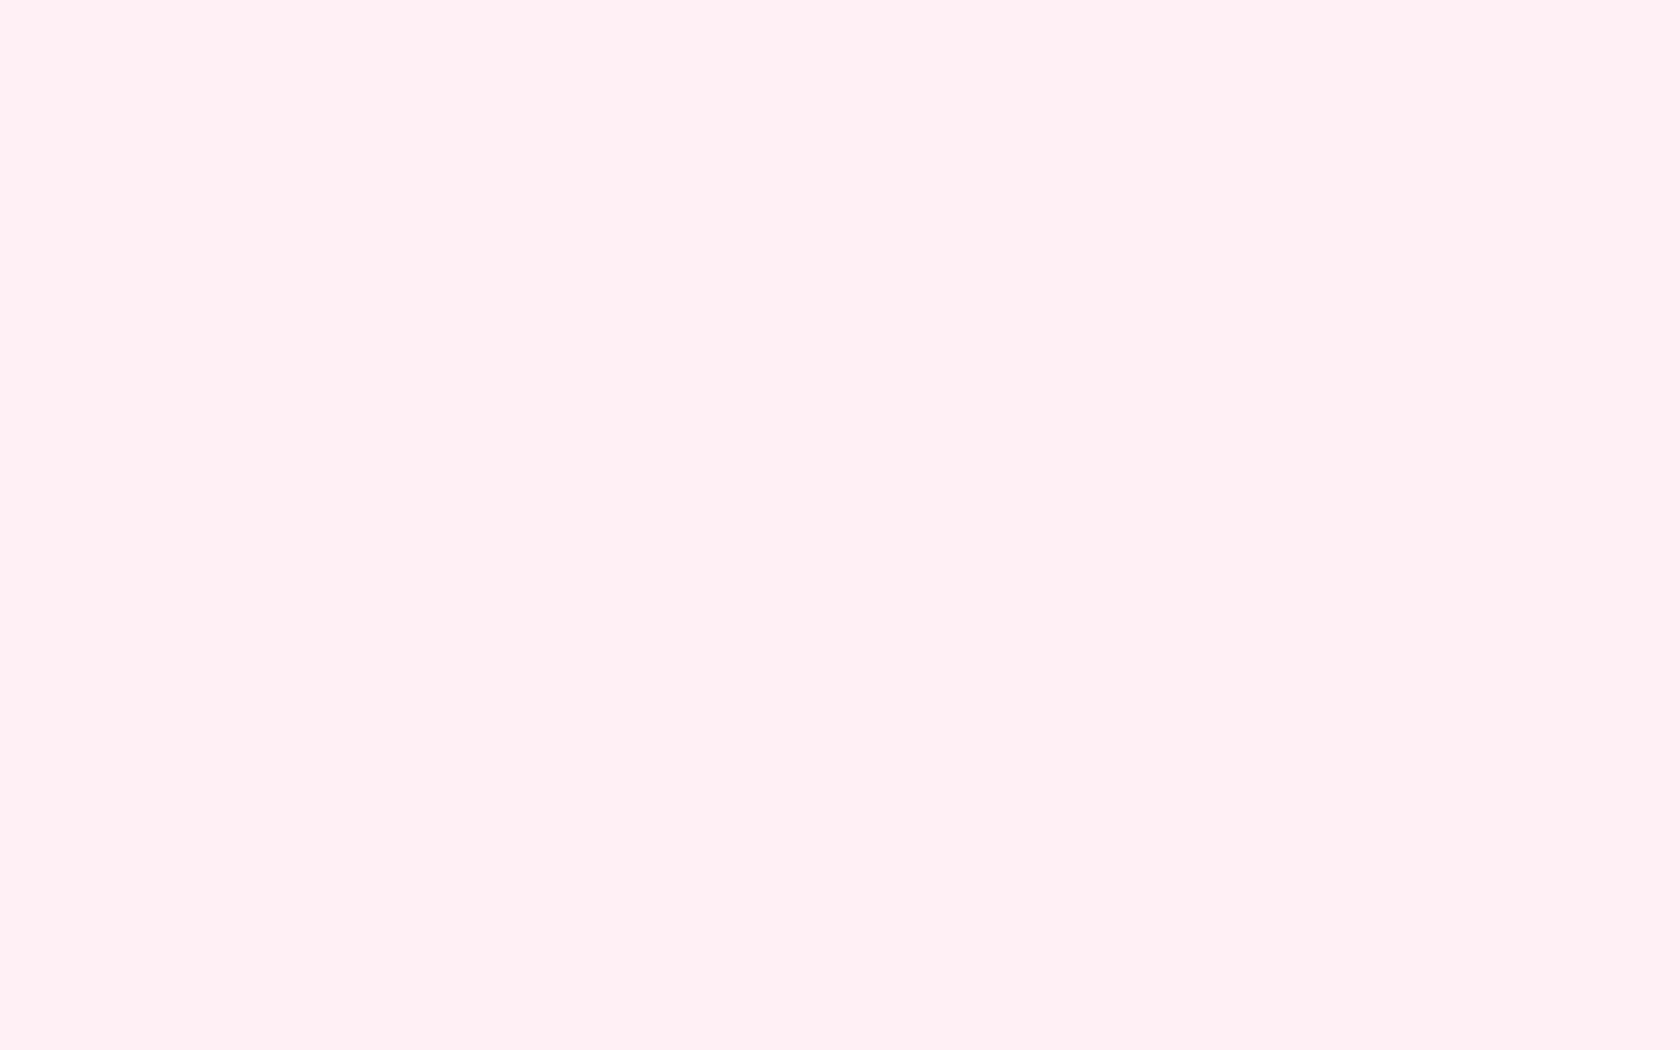 1680x1050 Lavender Blush Solid Color Background